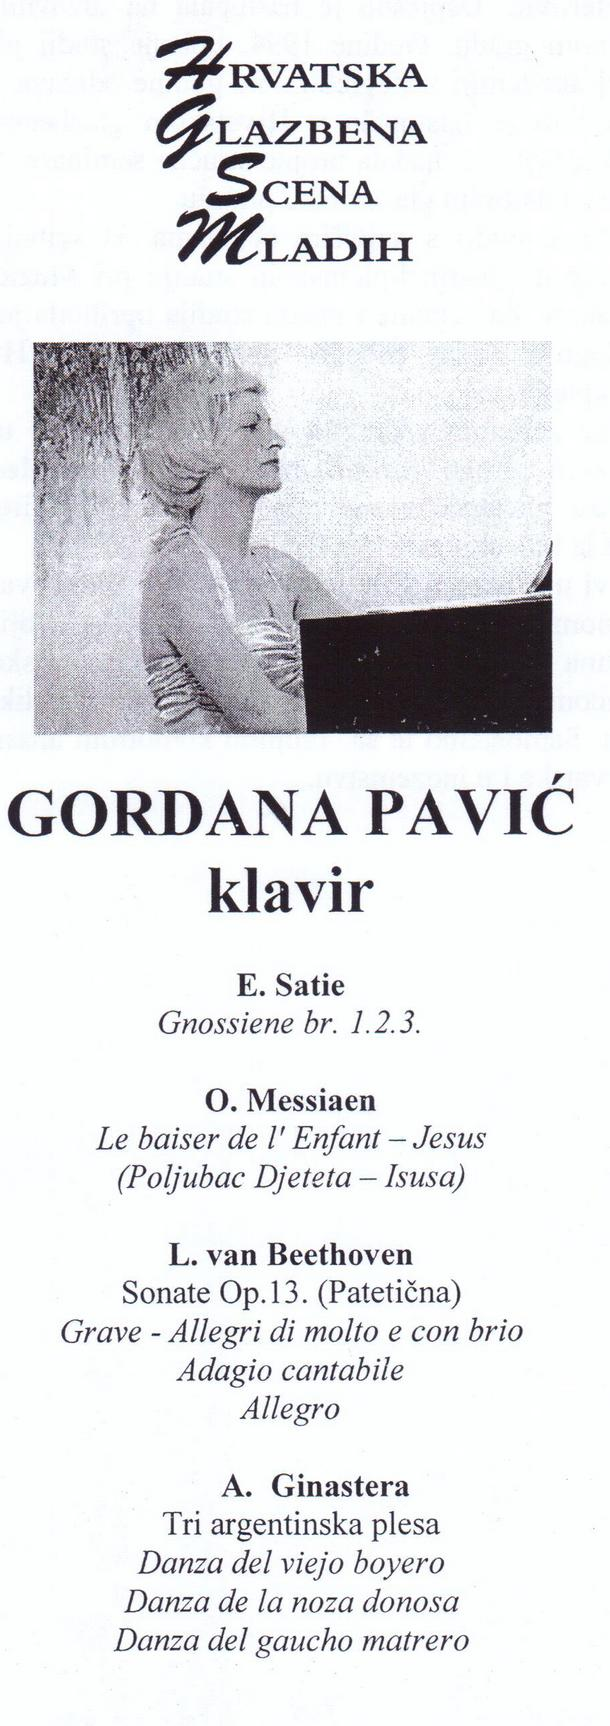 koncert_gordana_pavic01